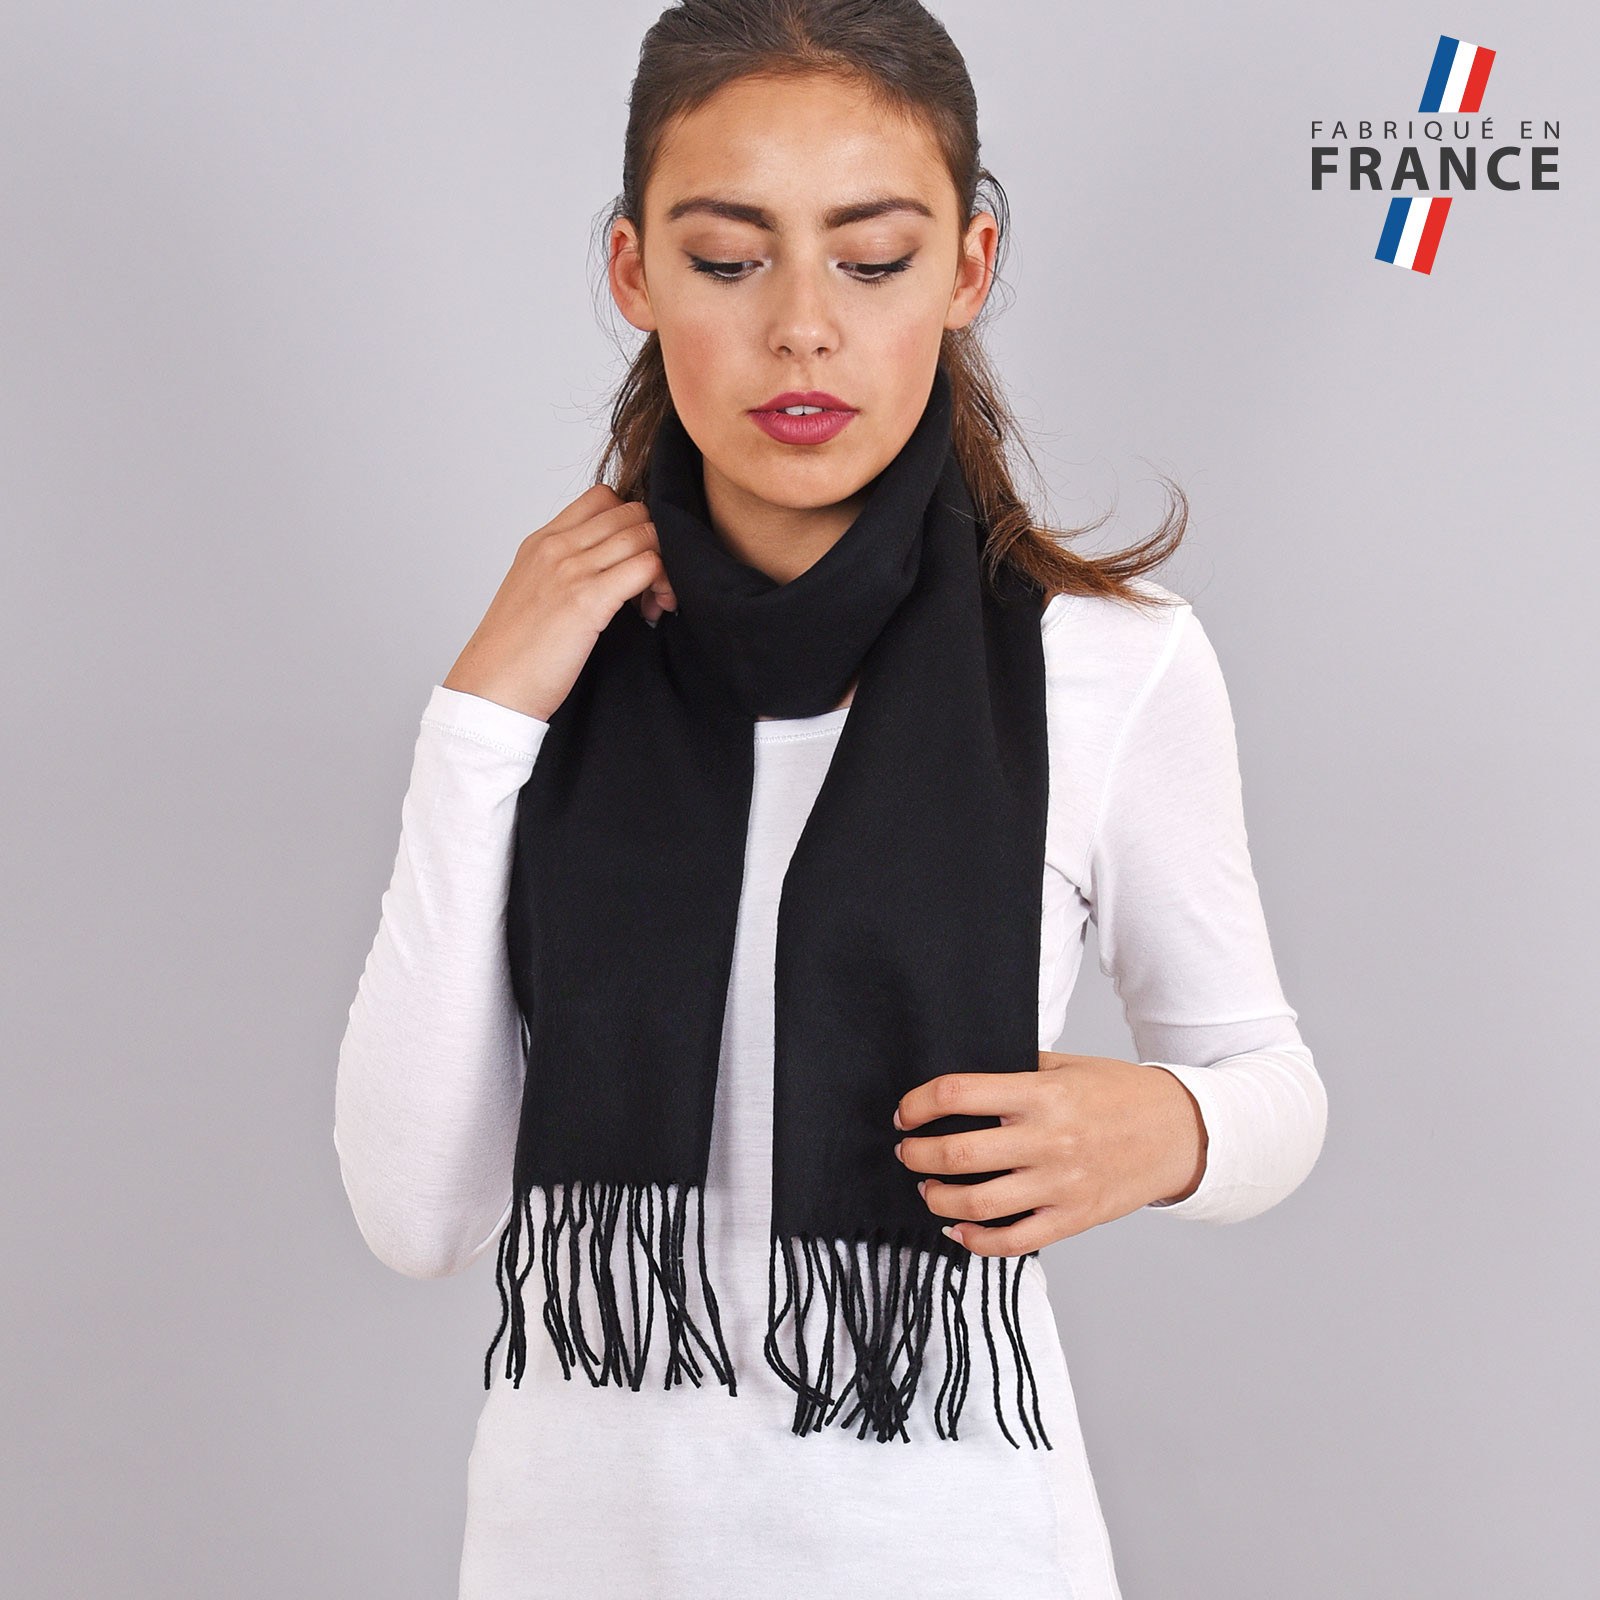 AT-03231-VF16-LB_FR-echarpe-a-franges-noire-fabrication-francaise